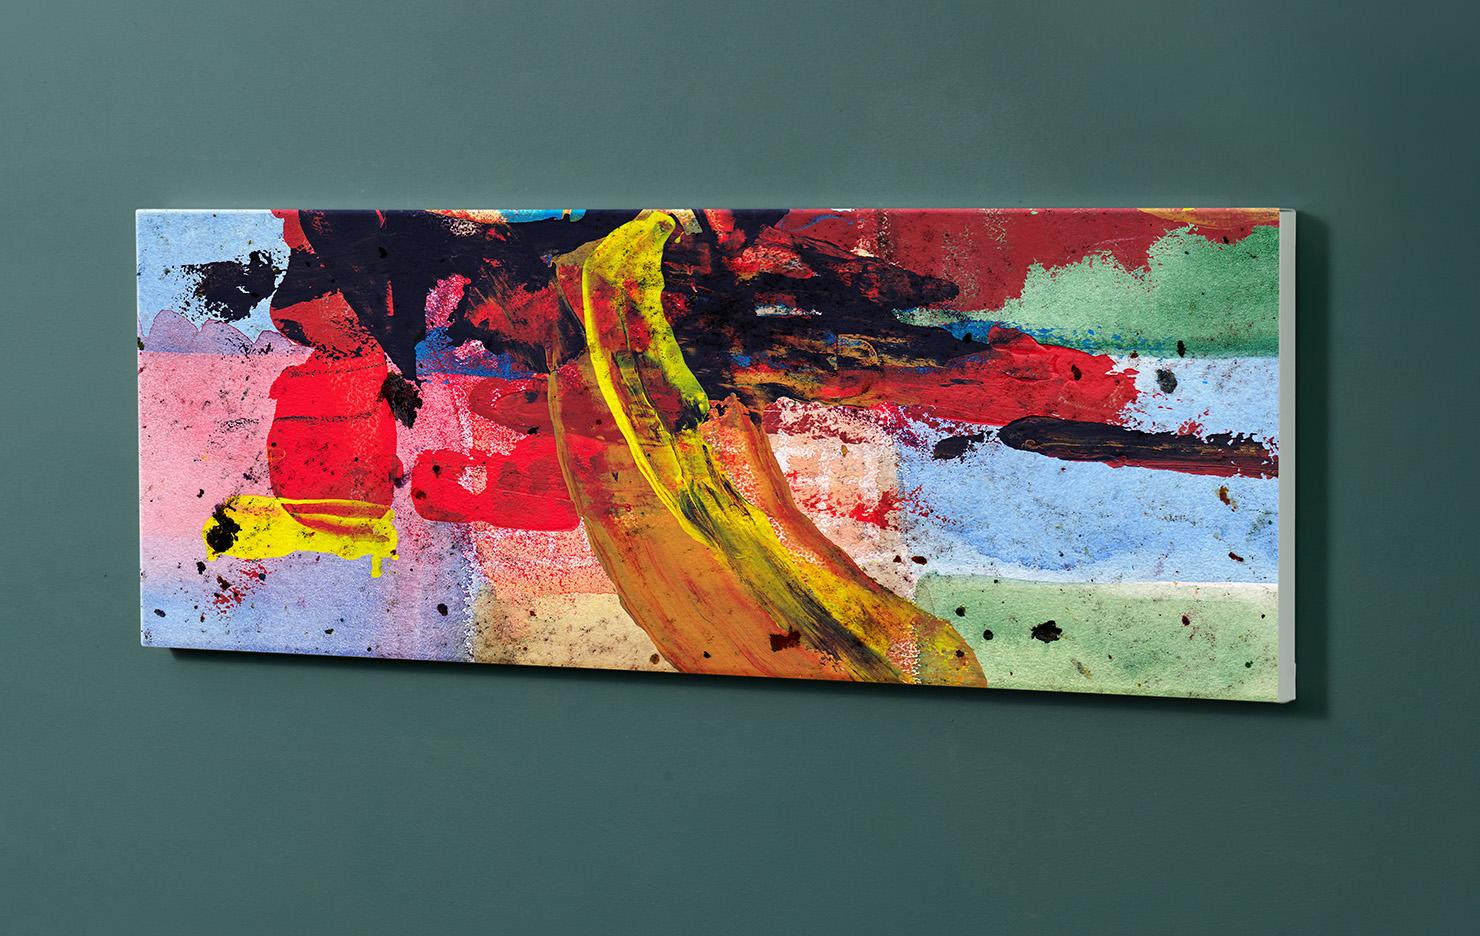 Magnettafel NOTIZ 90x30cm Motiv-Pinnwand M162 Abstrakt Kunst